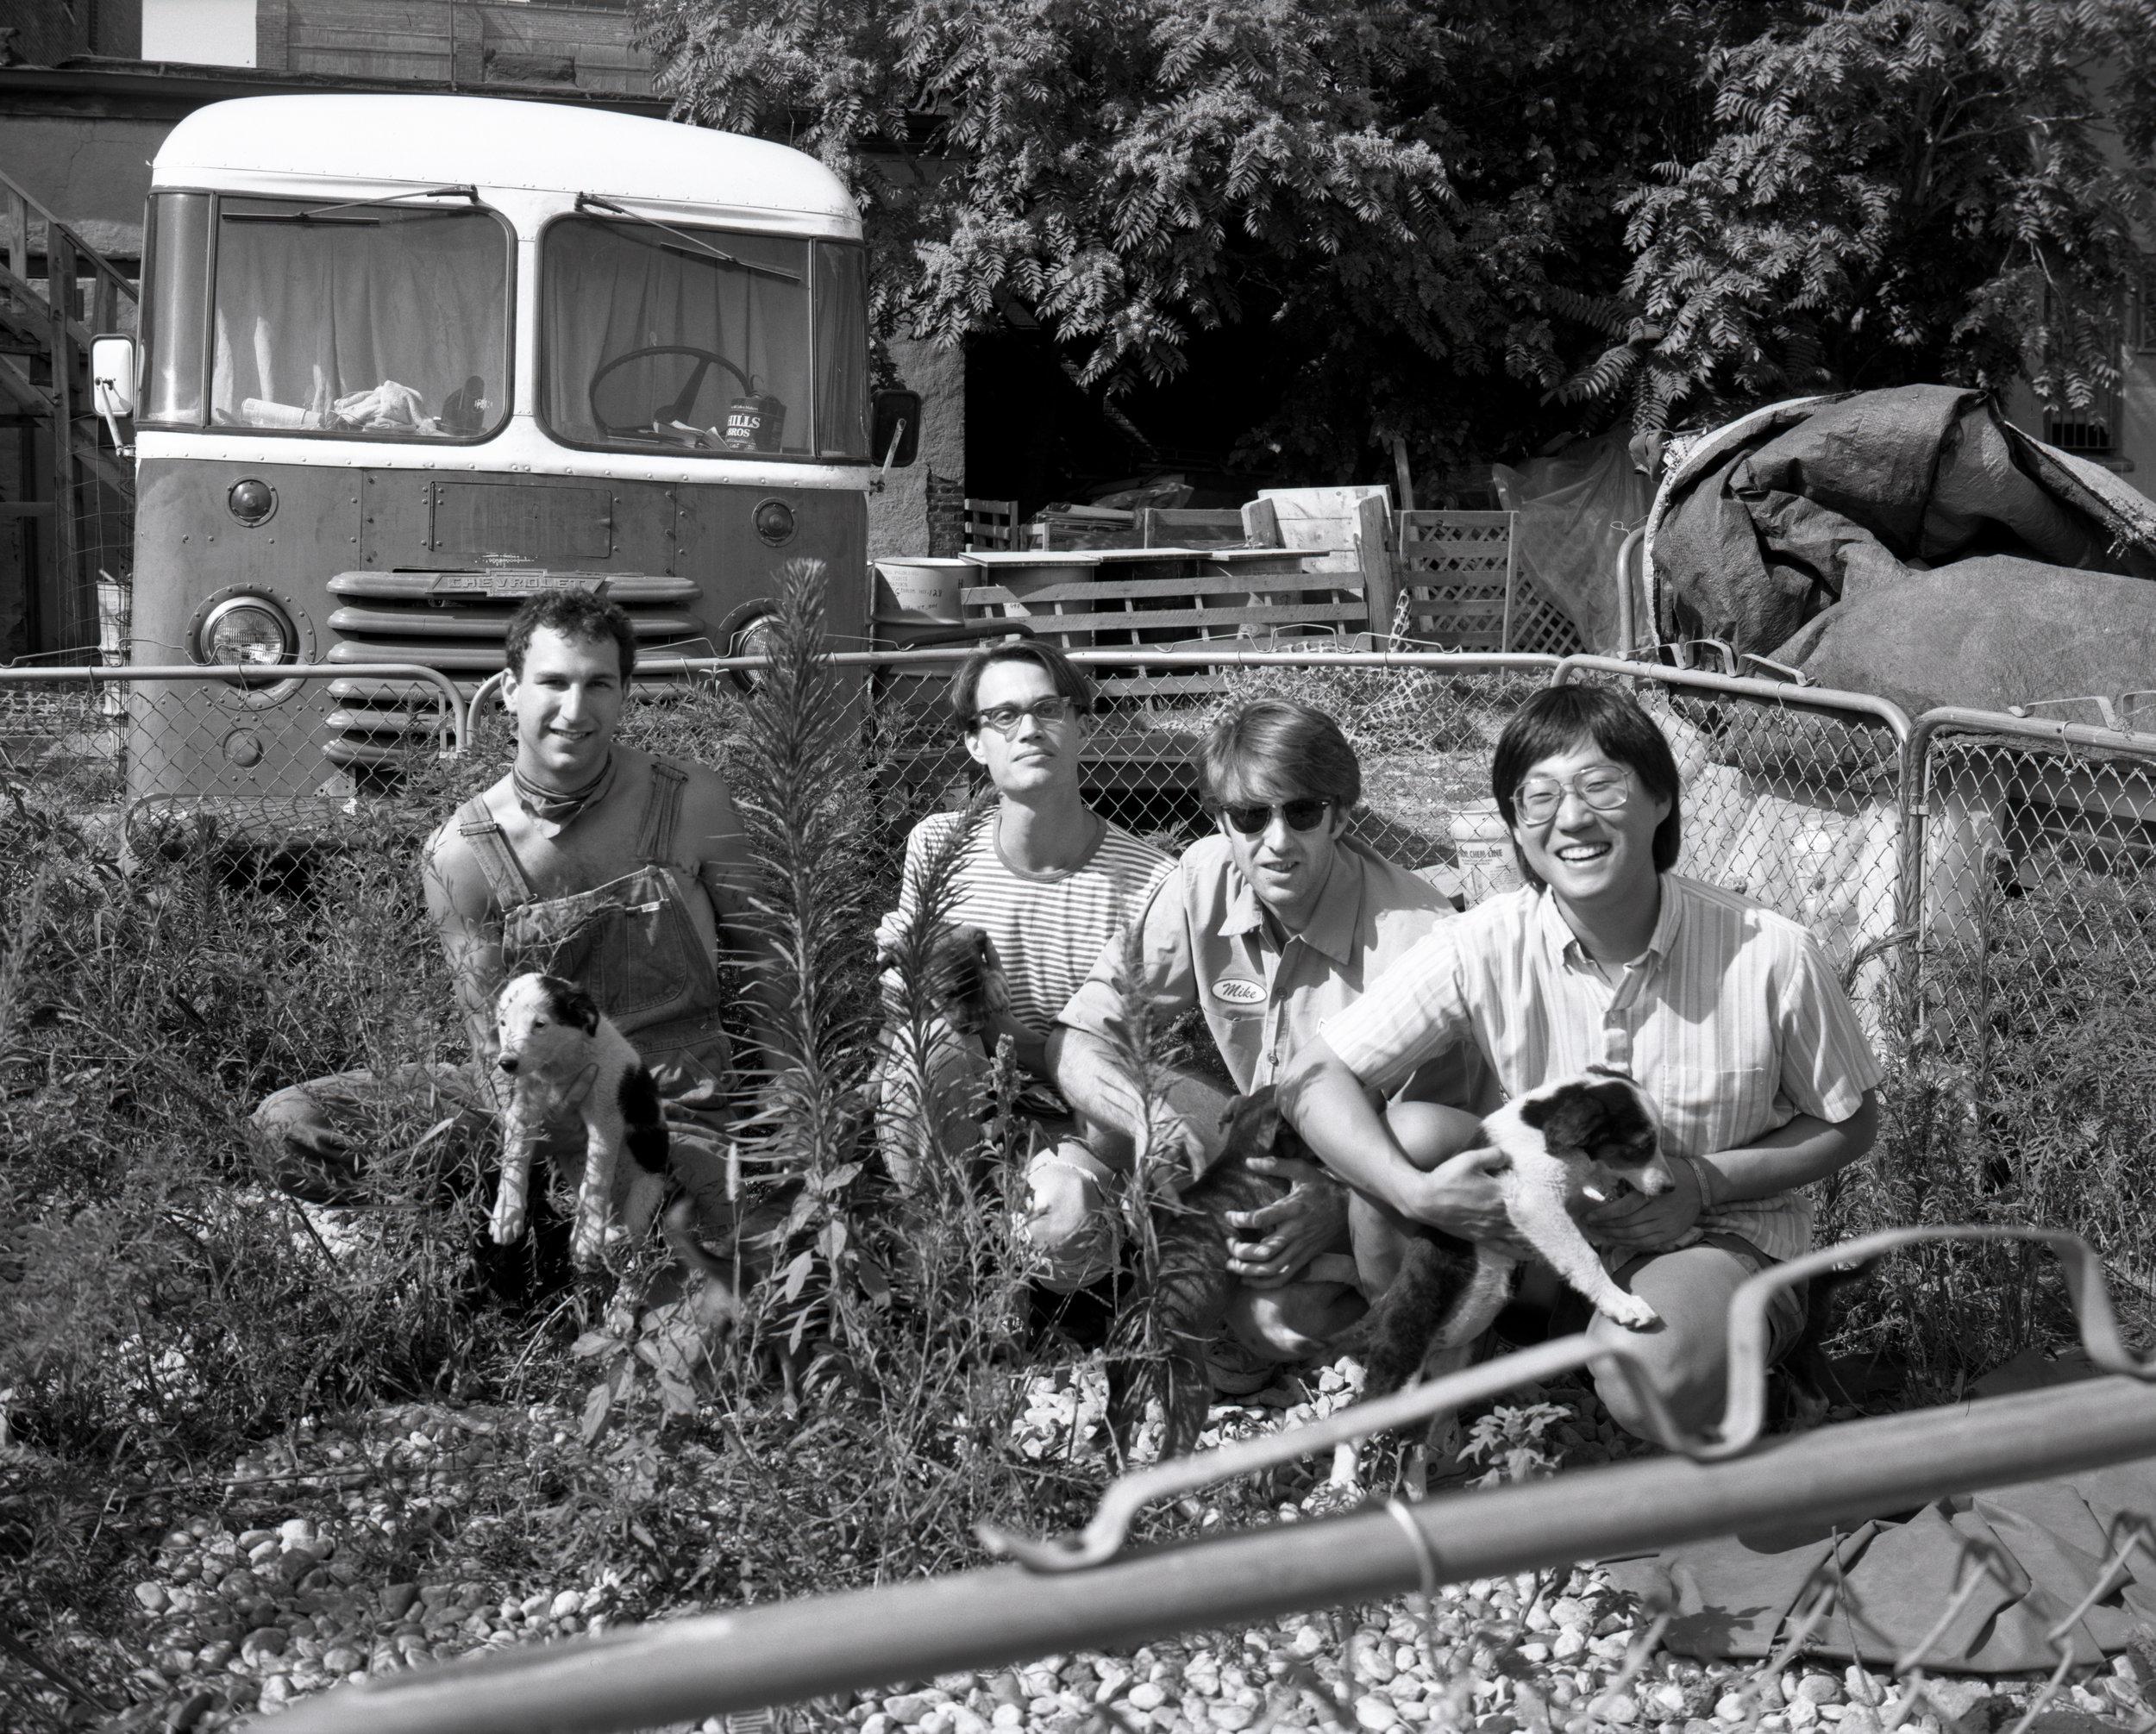 img051 Lilacs in junkyard with puppies on Maxwell Street Fall 1991.jpg